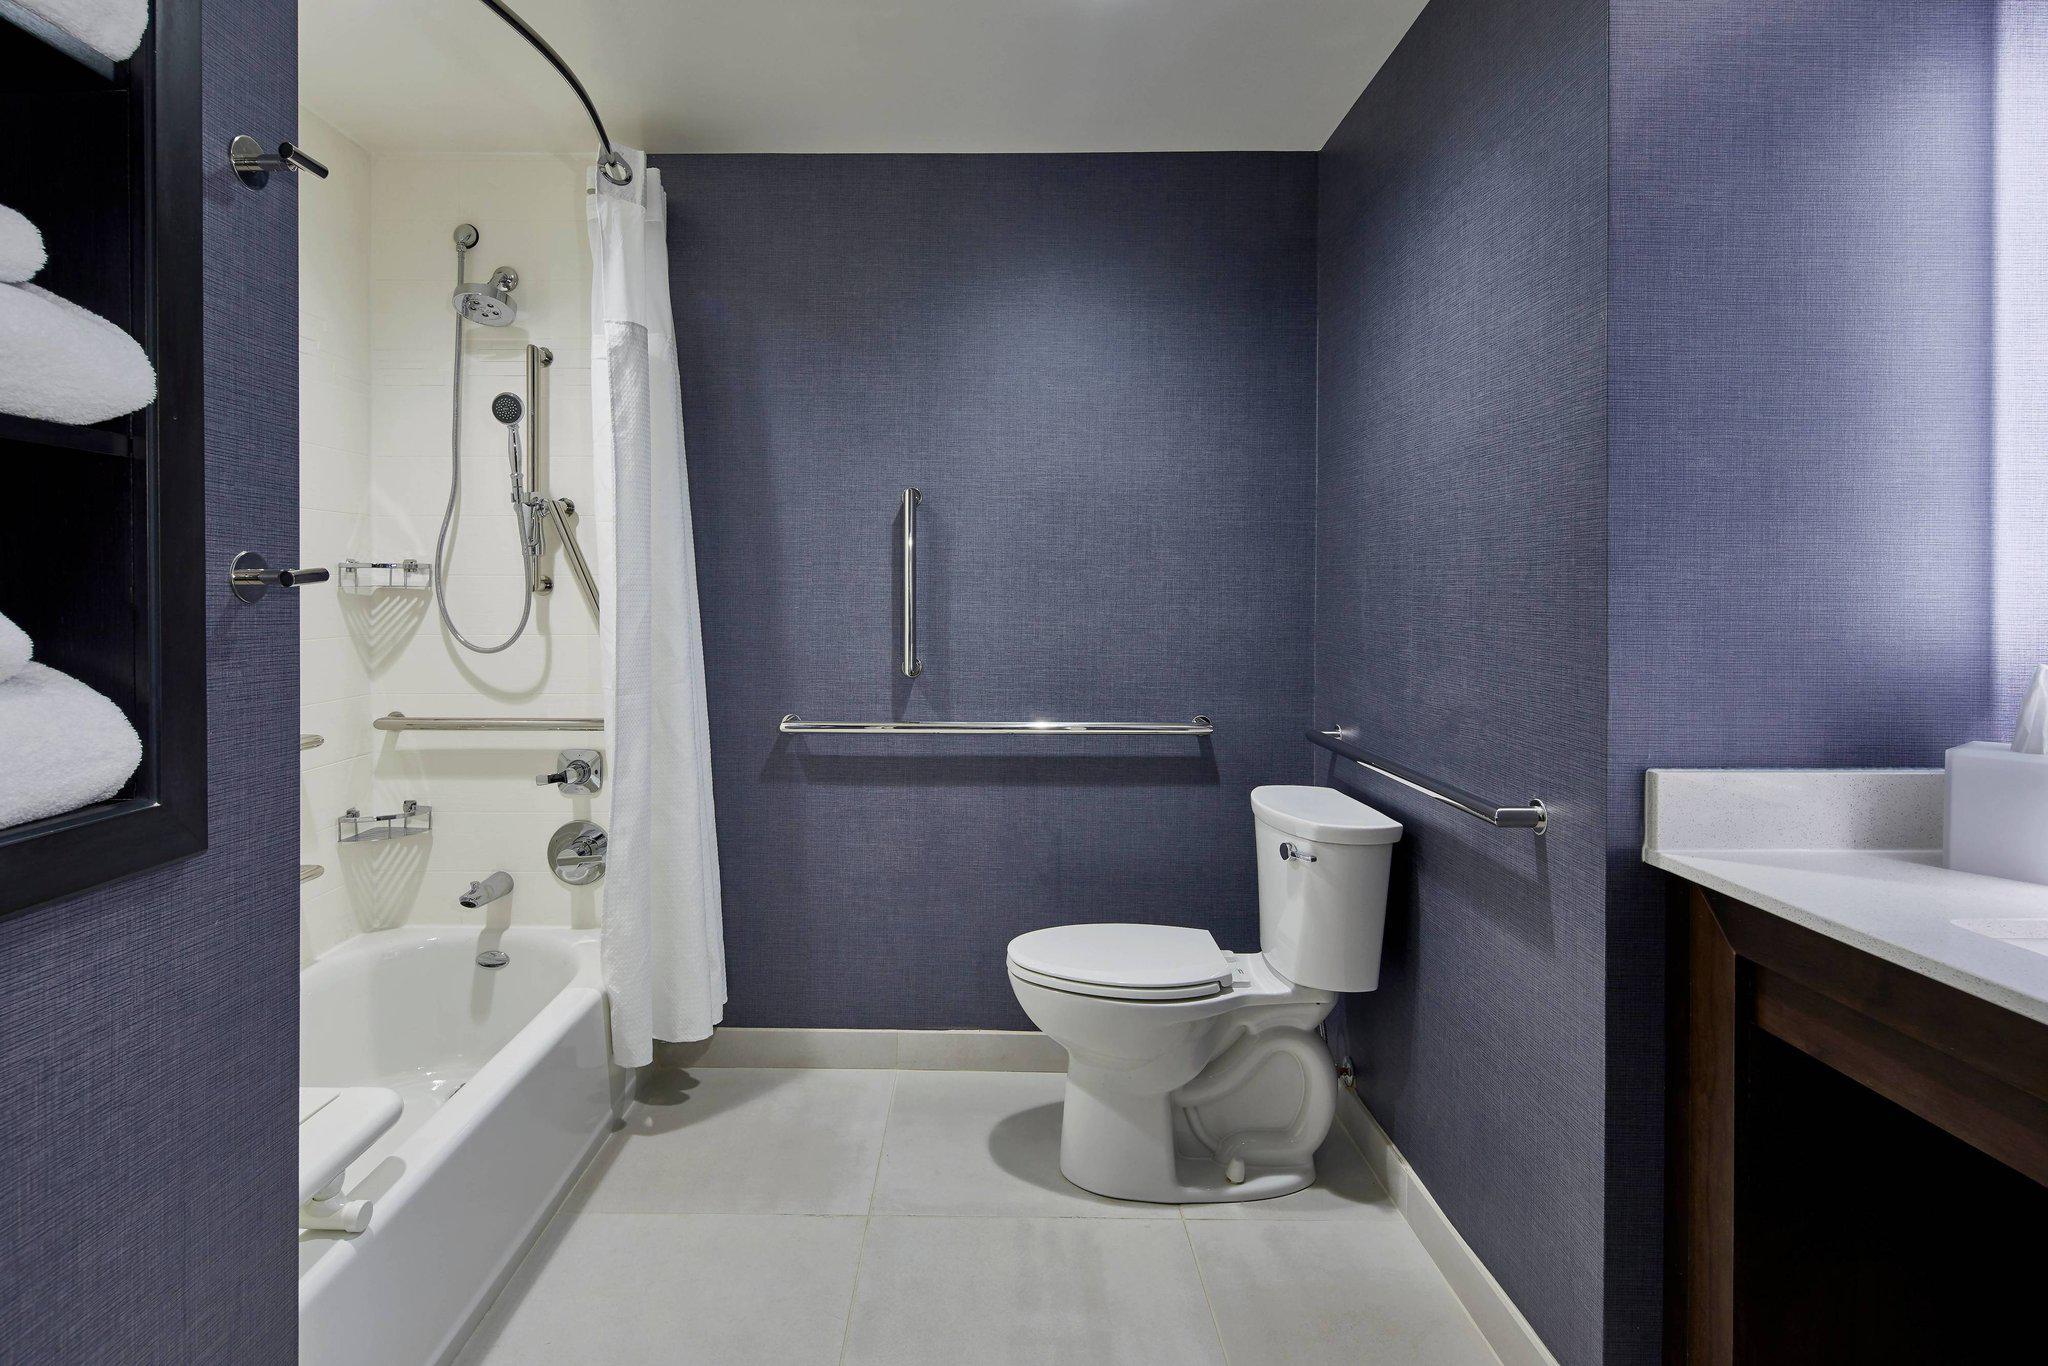 Residence Inn by Marriott Albany Airport